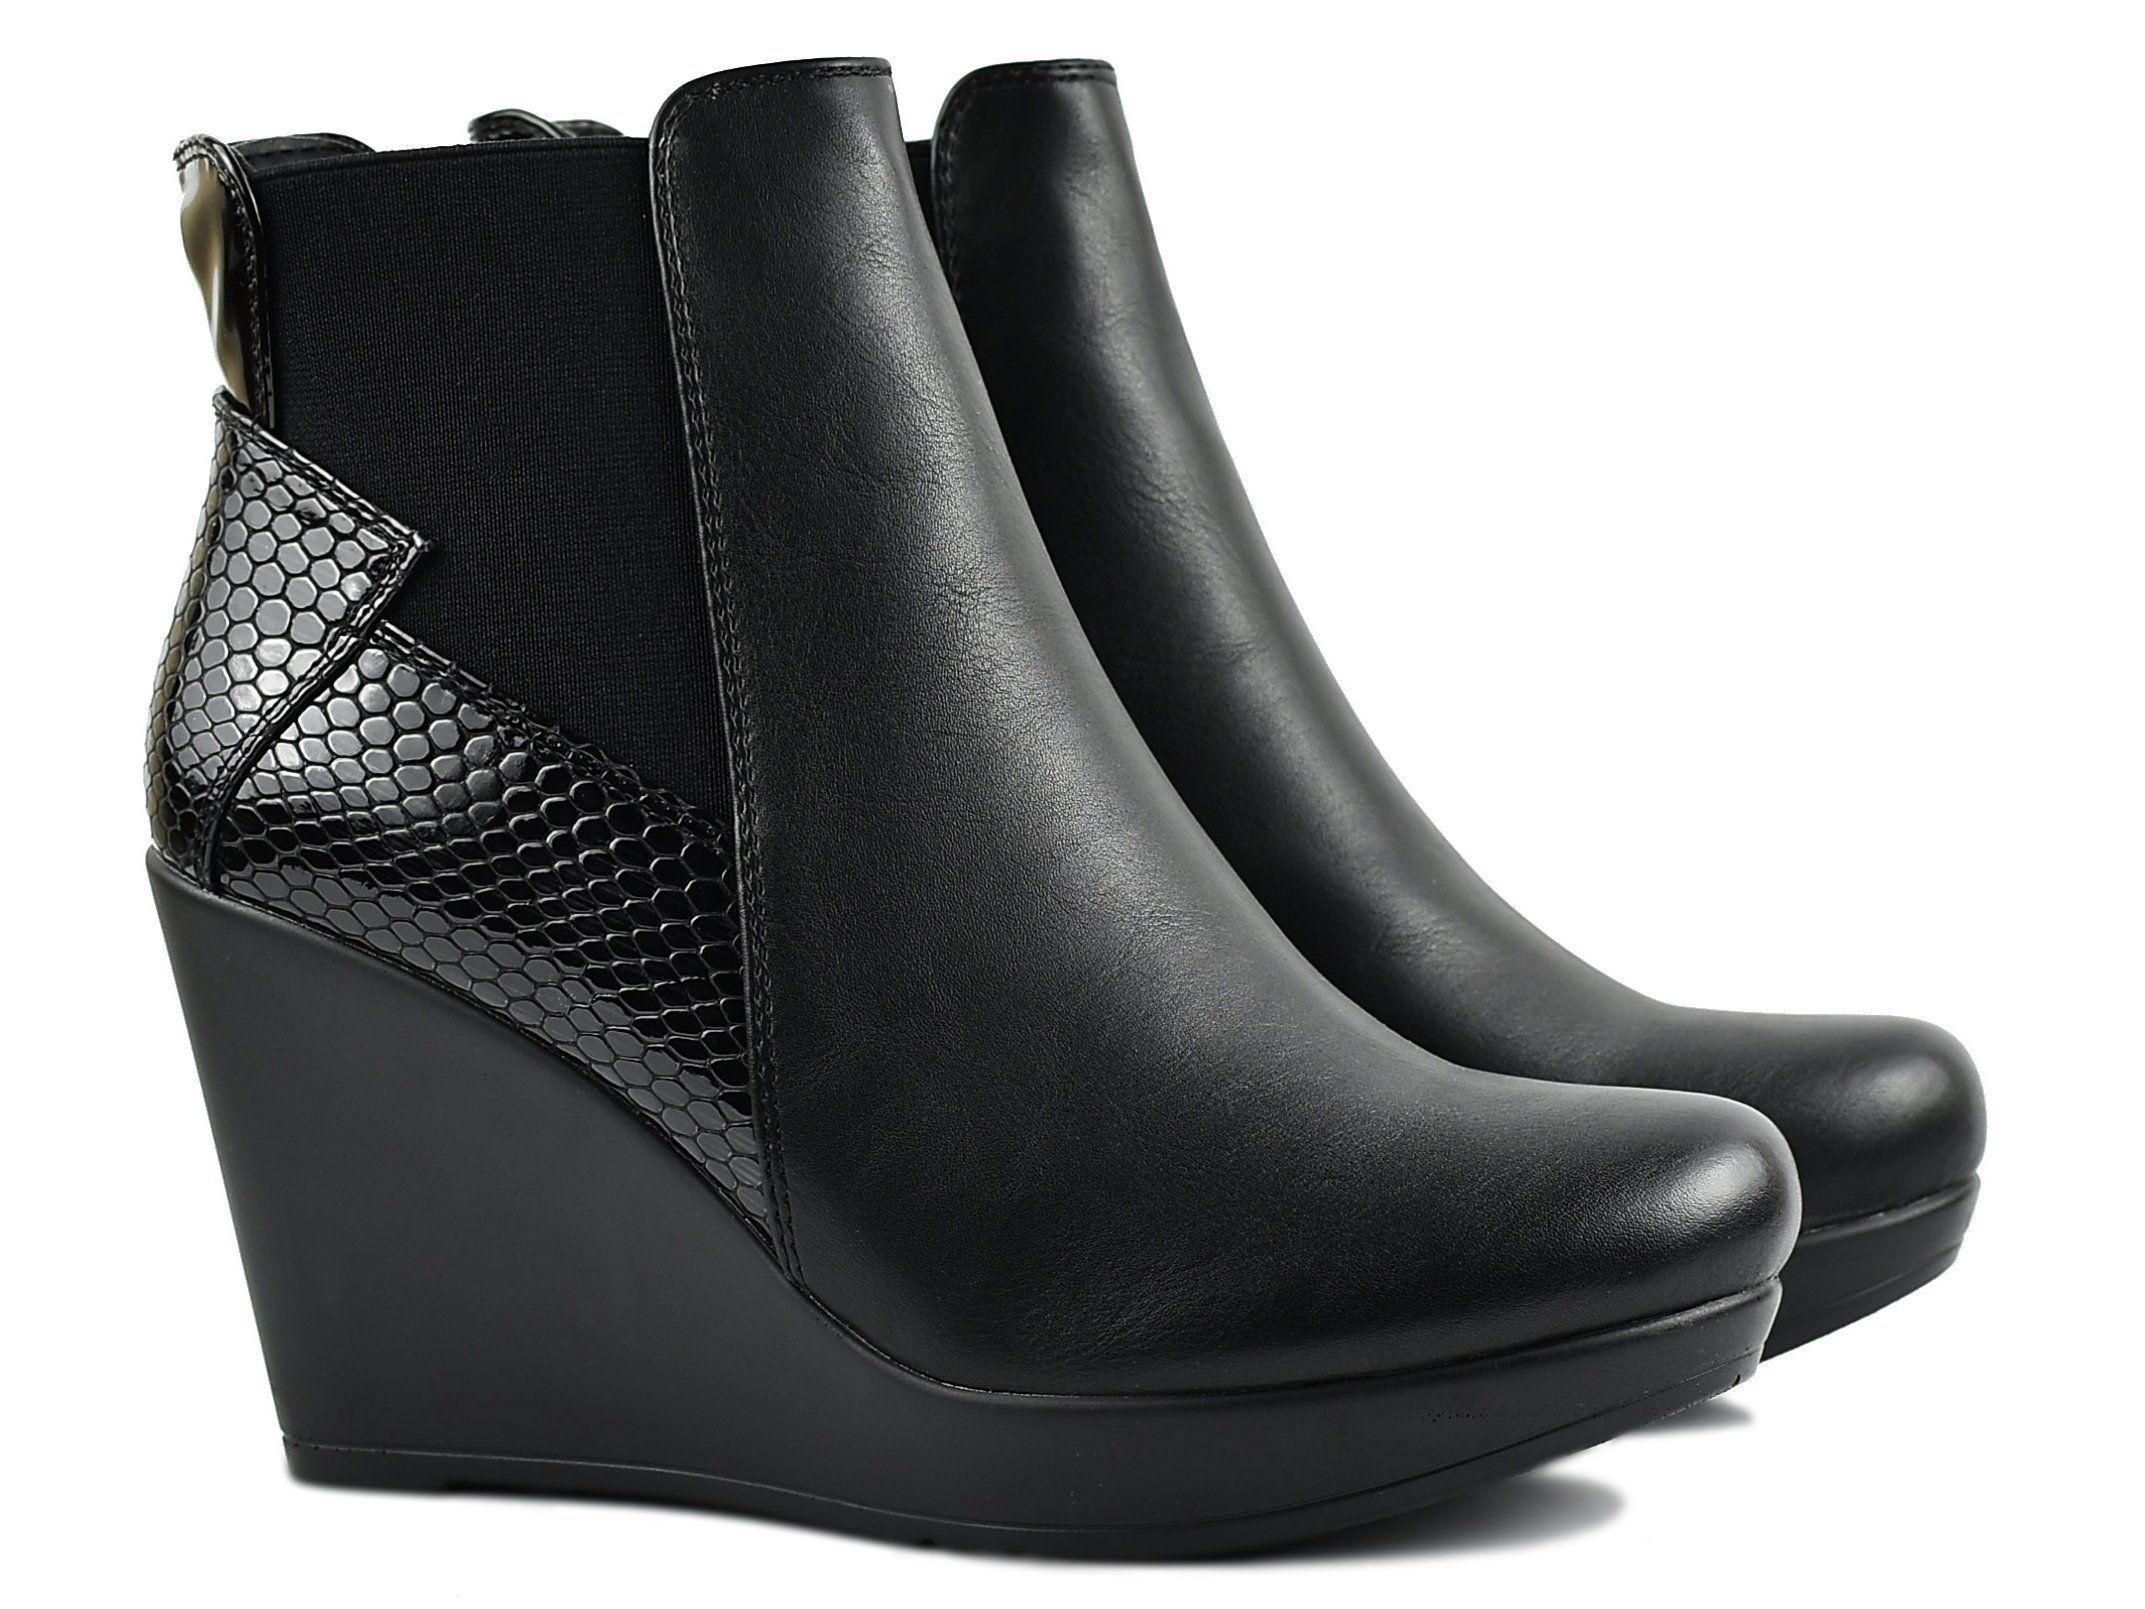 Sergio Leone Botki Koturny Platformy Ocieplane 6536878930 Oficjalne Archiwum Allegro Boots Shoes Wedge Boot